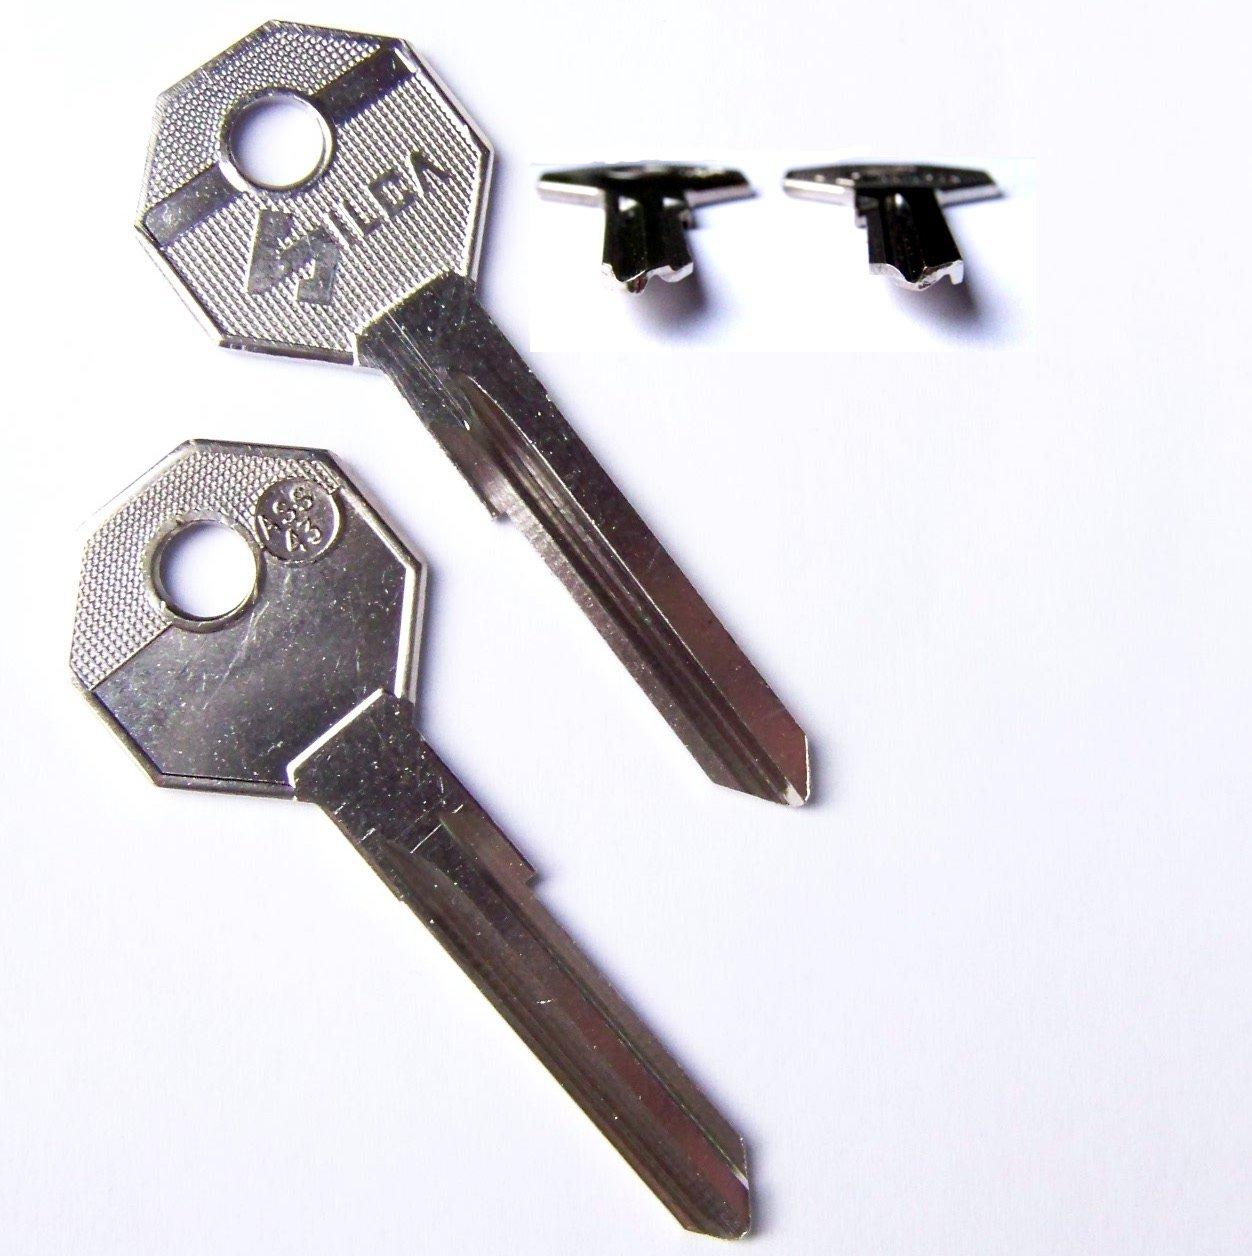 SAAB Key Blank up to 1973 fits 95 96 99 ASS43